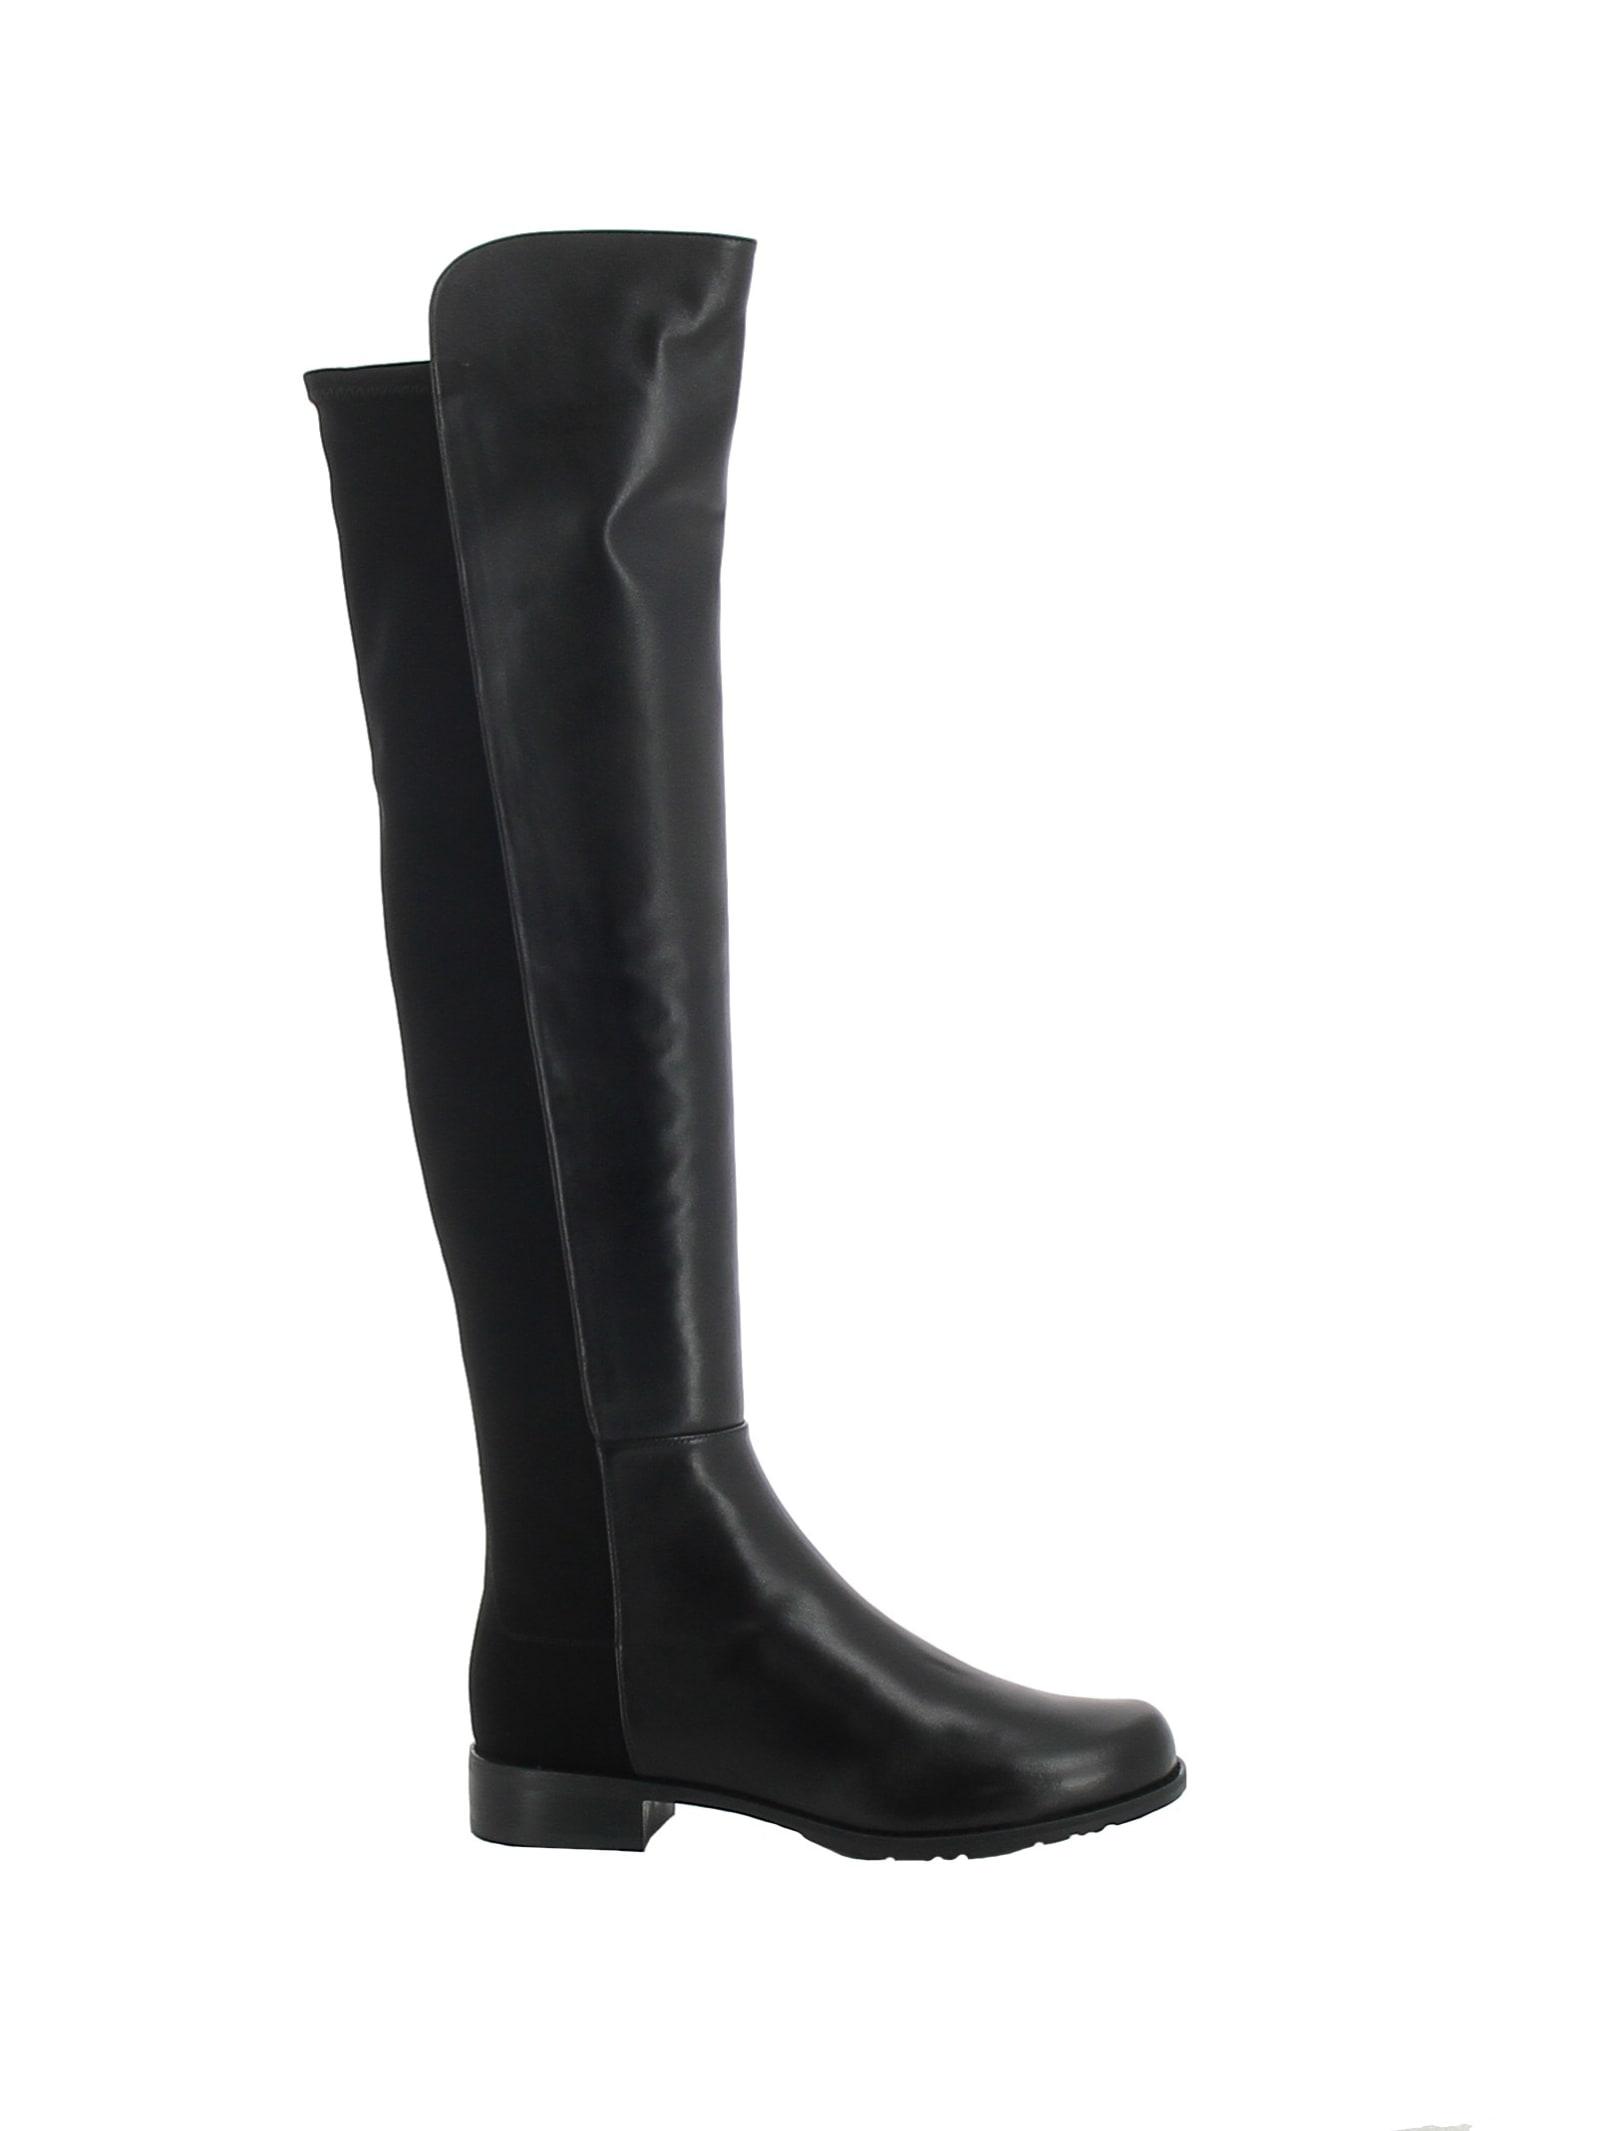 Stuart Weitzman S3999 Black Leather 5050 Boots